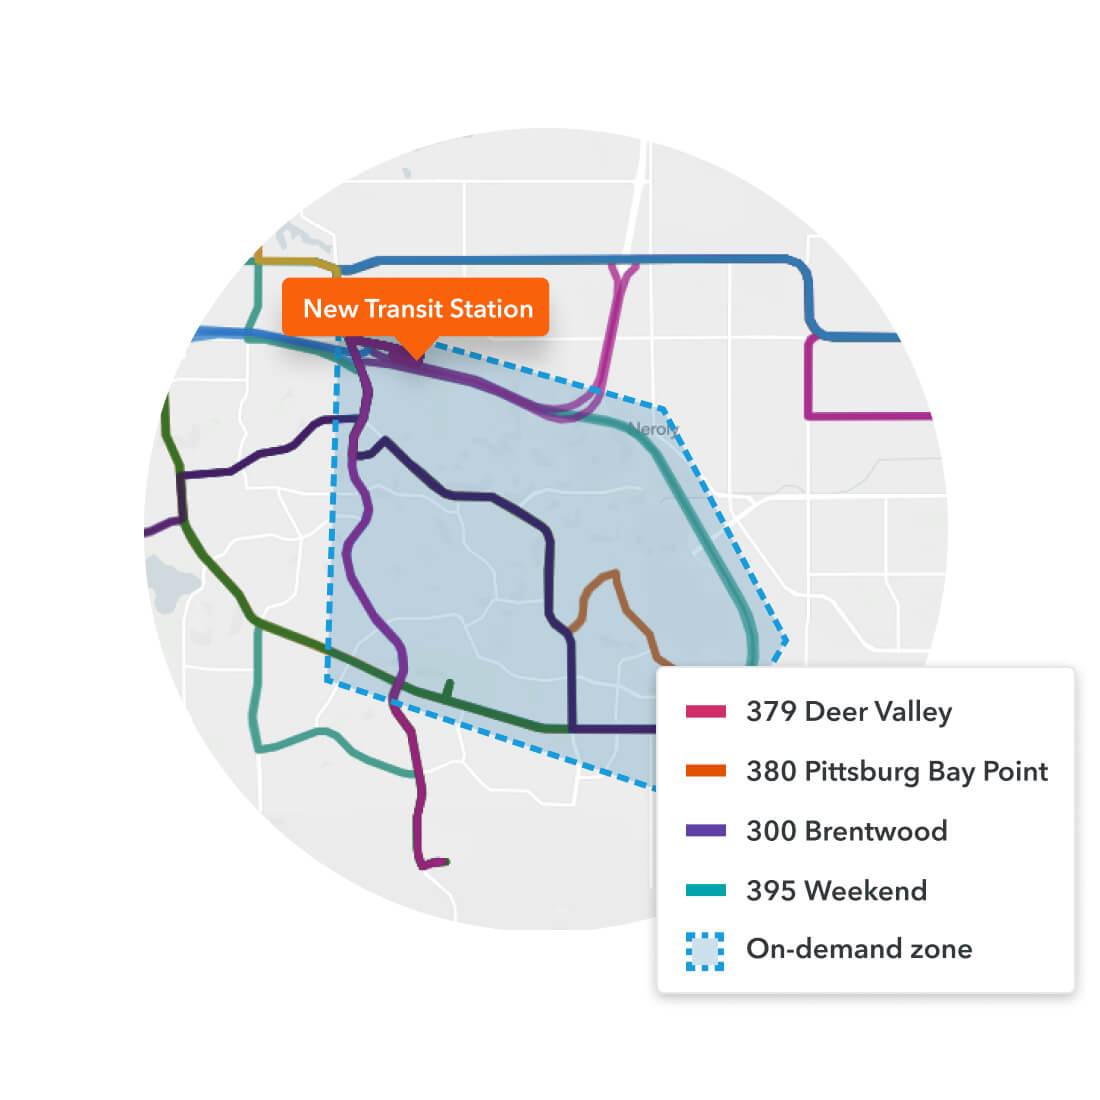 Remix Scheduling integrated transportation